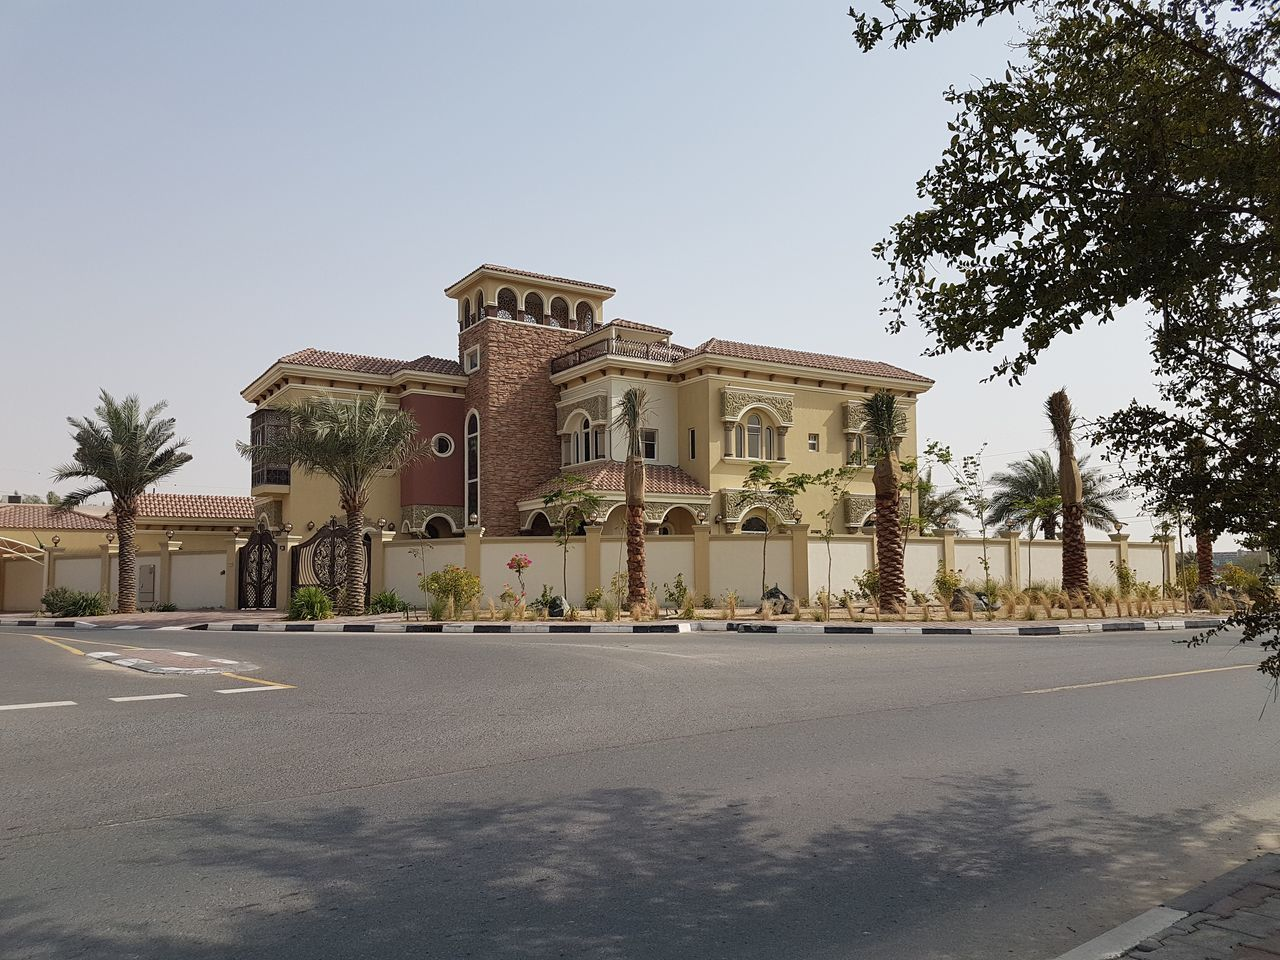 Hz339 AViewFromDubai دبي تصويري Lovlidubai